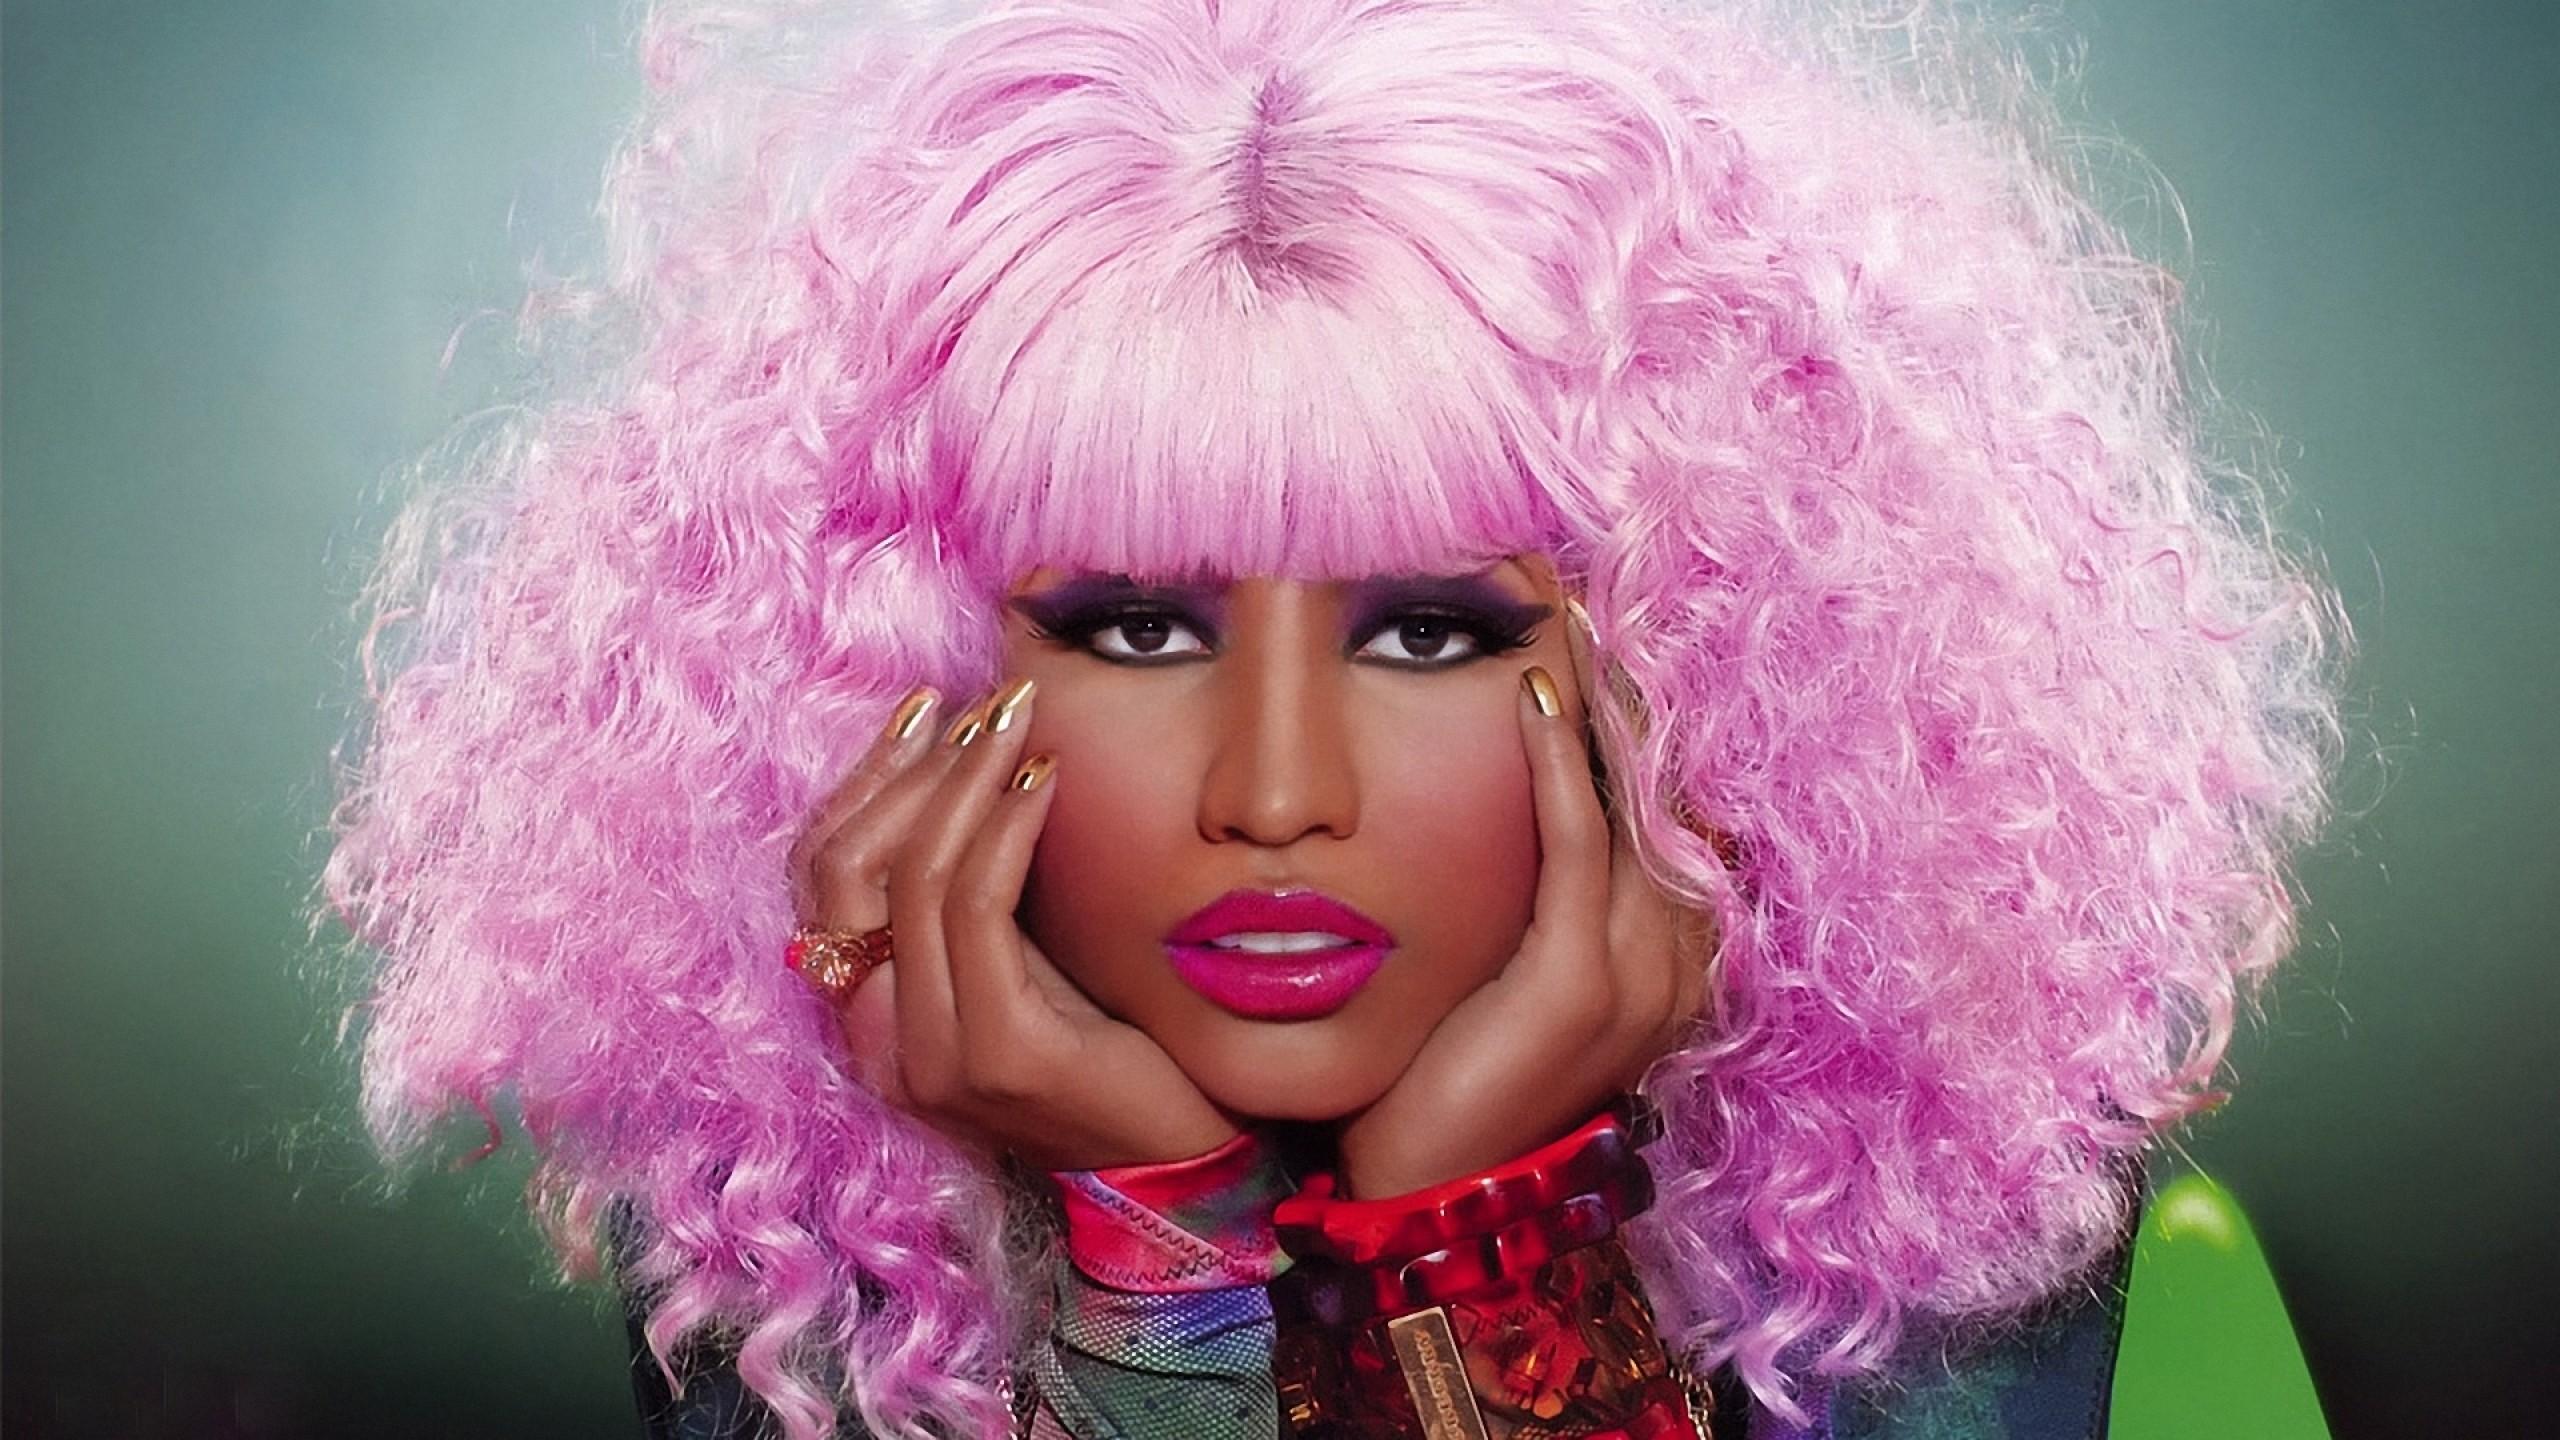 Wallpaper nicki minaj, haircut, pink, face, makeup